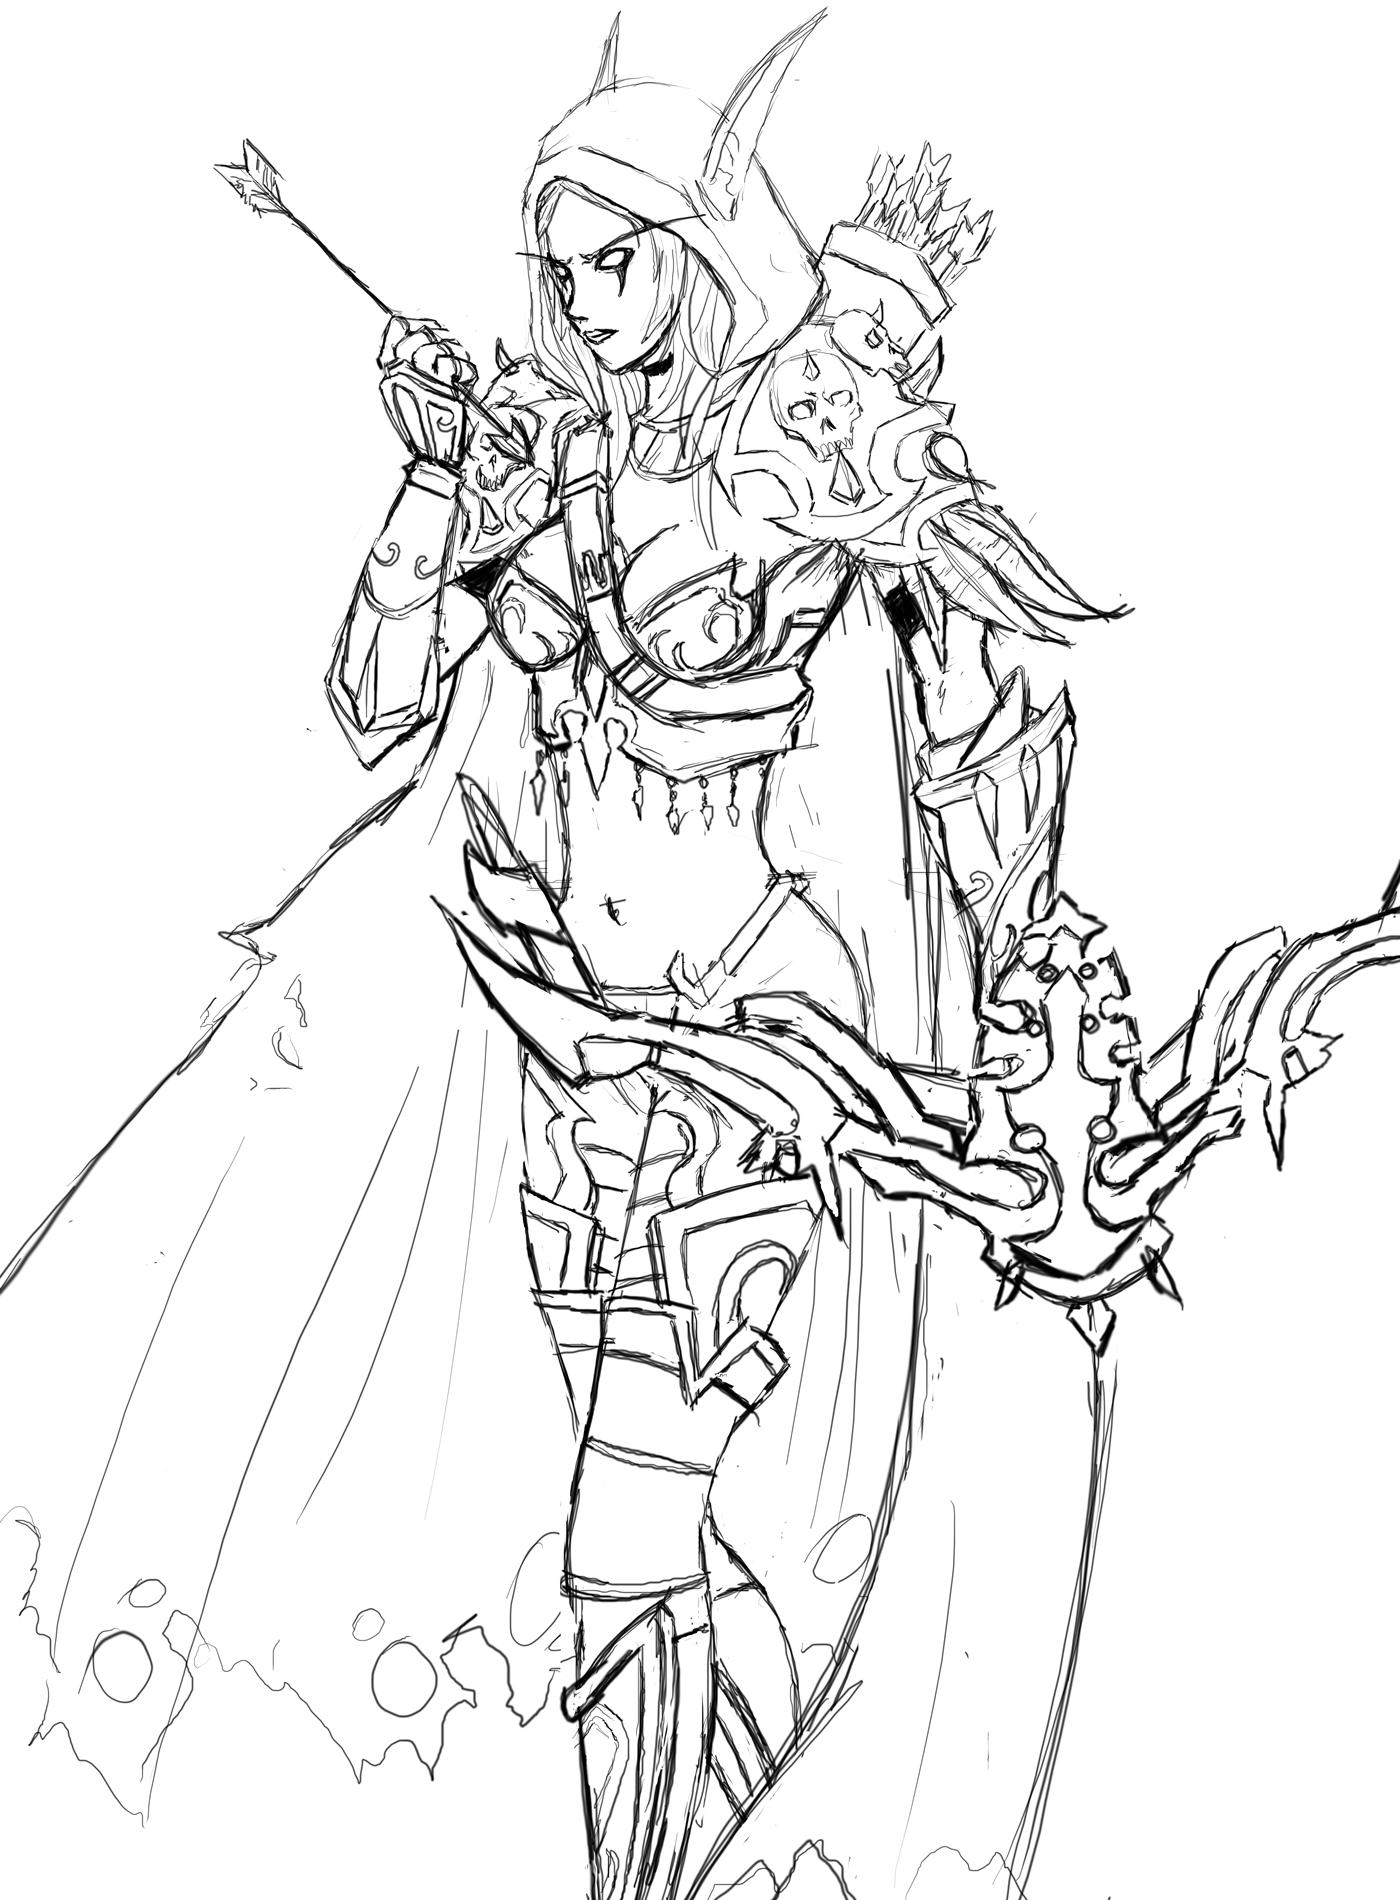 Warcraft - Sylvanas by vaghot on DeviantArt